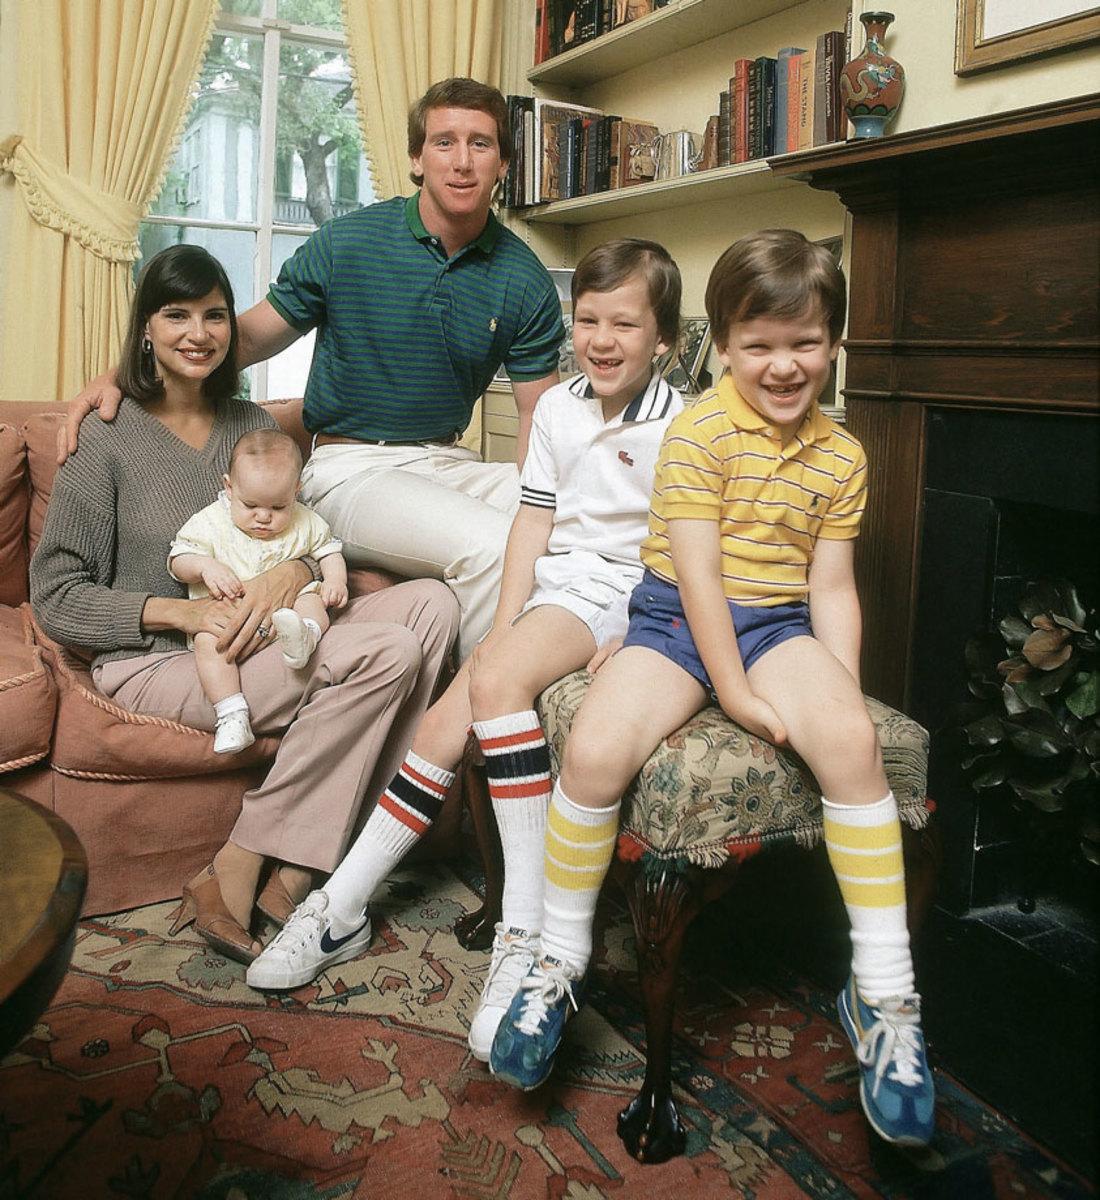 1981-Archie-Olivia-Cooper-Peyton-Eli-Manning-Family-portrait-001290677.jpg